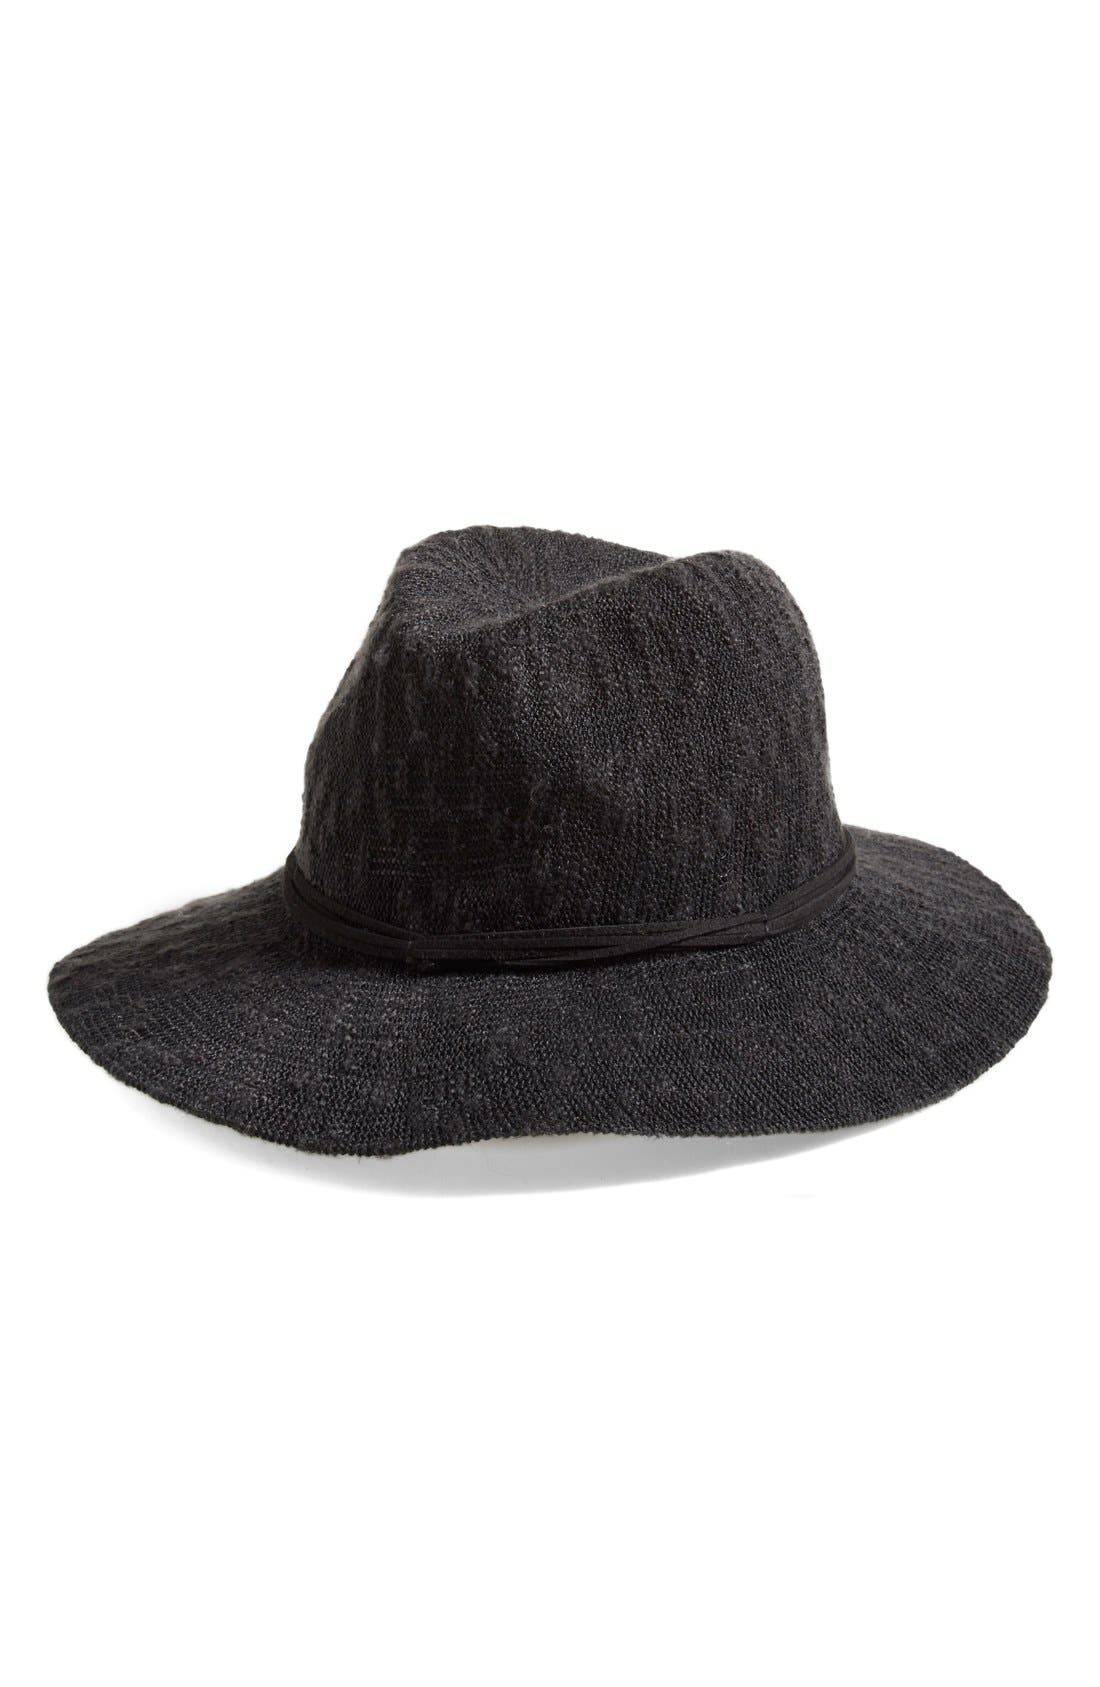 Main Image - Hinge Slub Knit Panama Hat